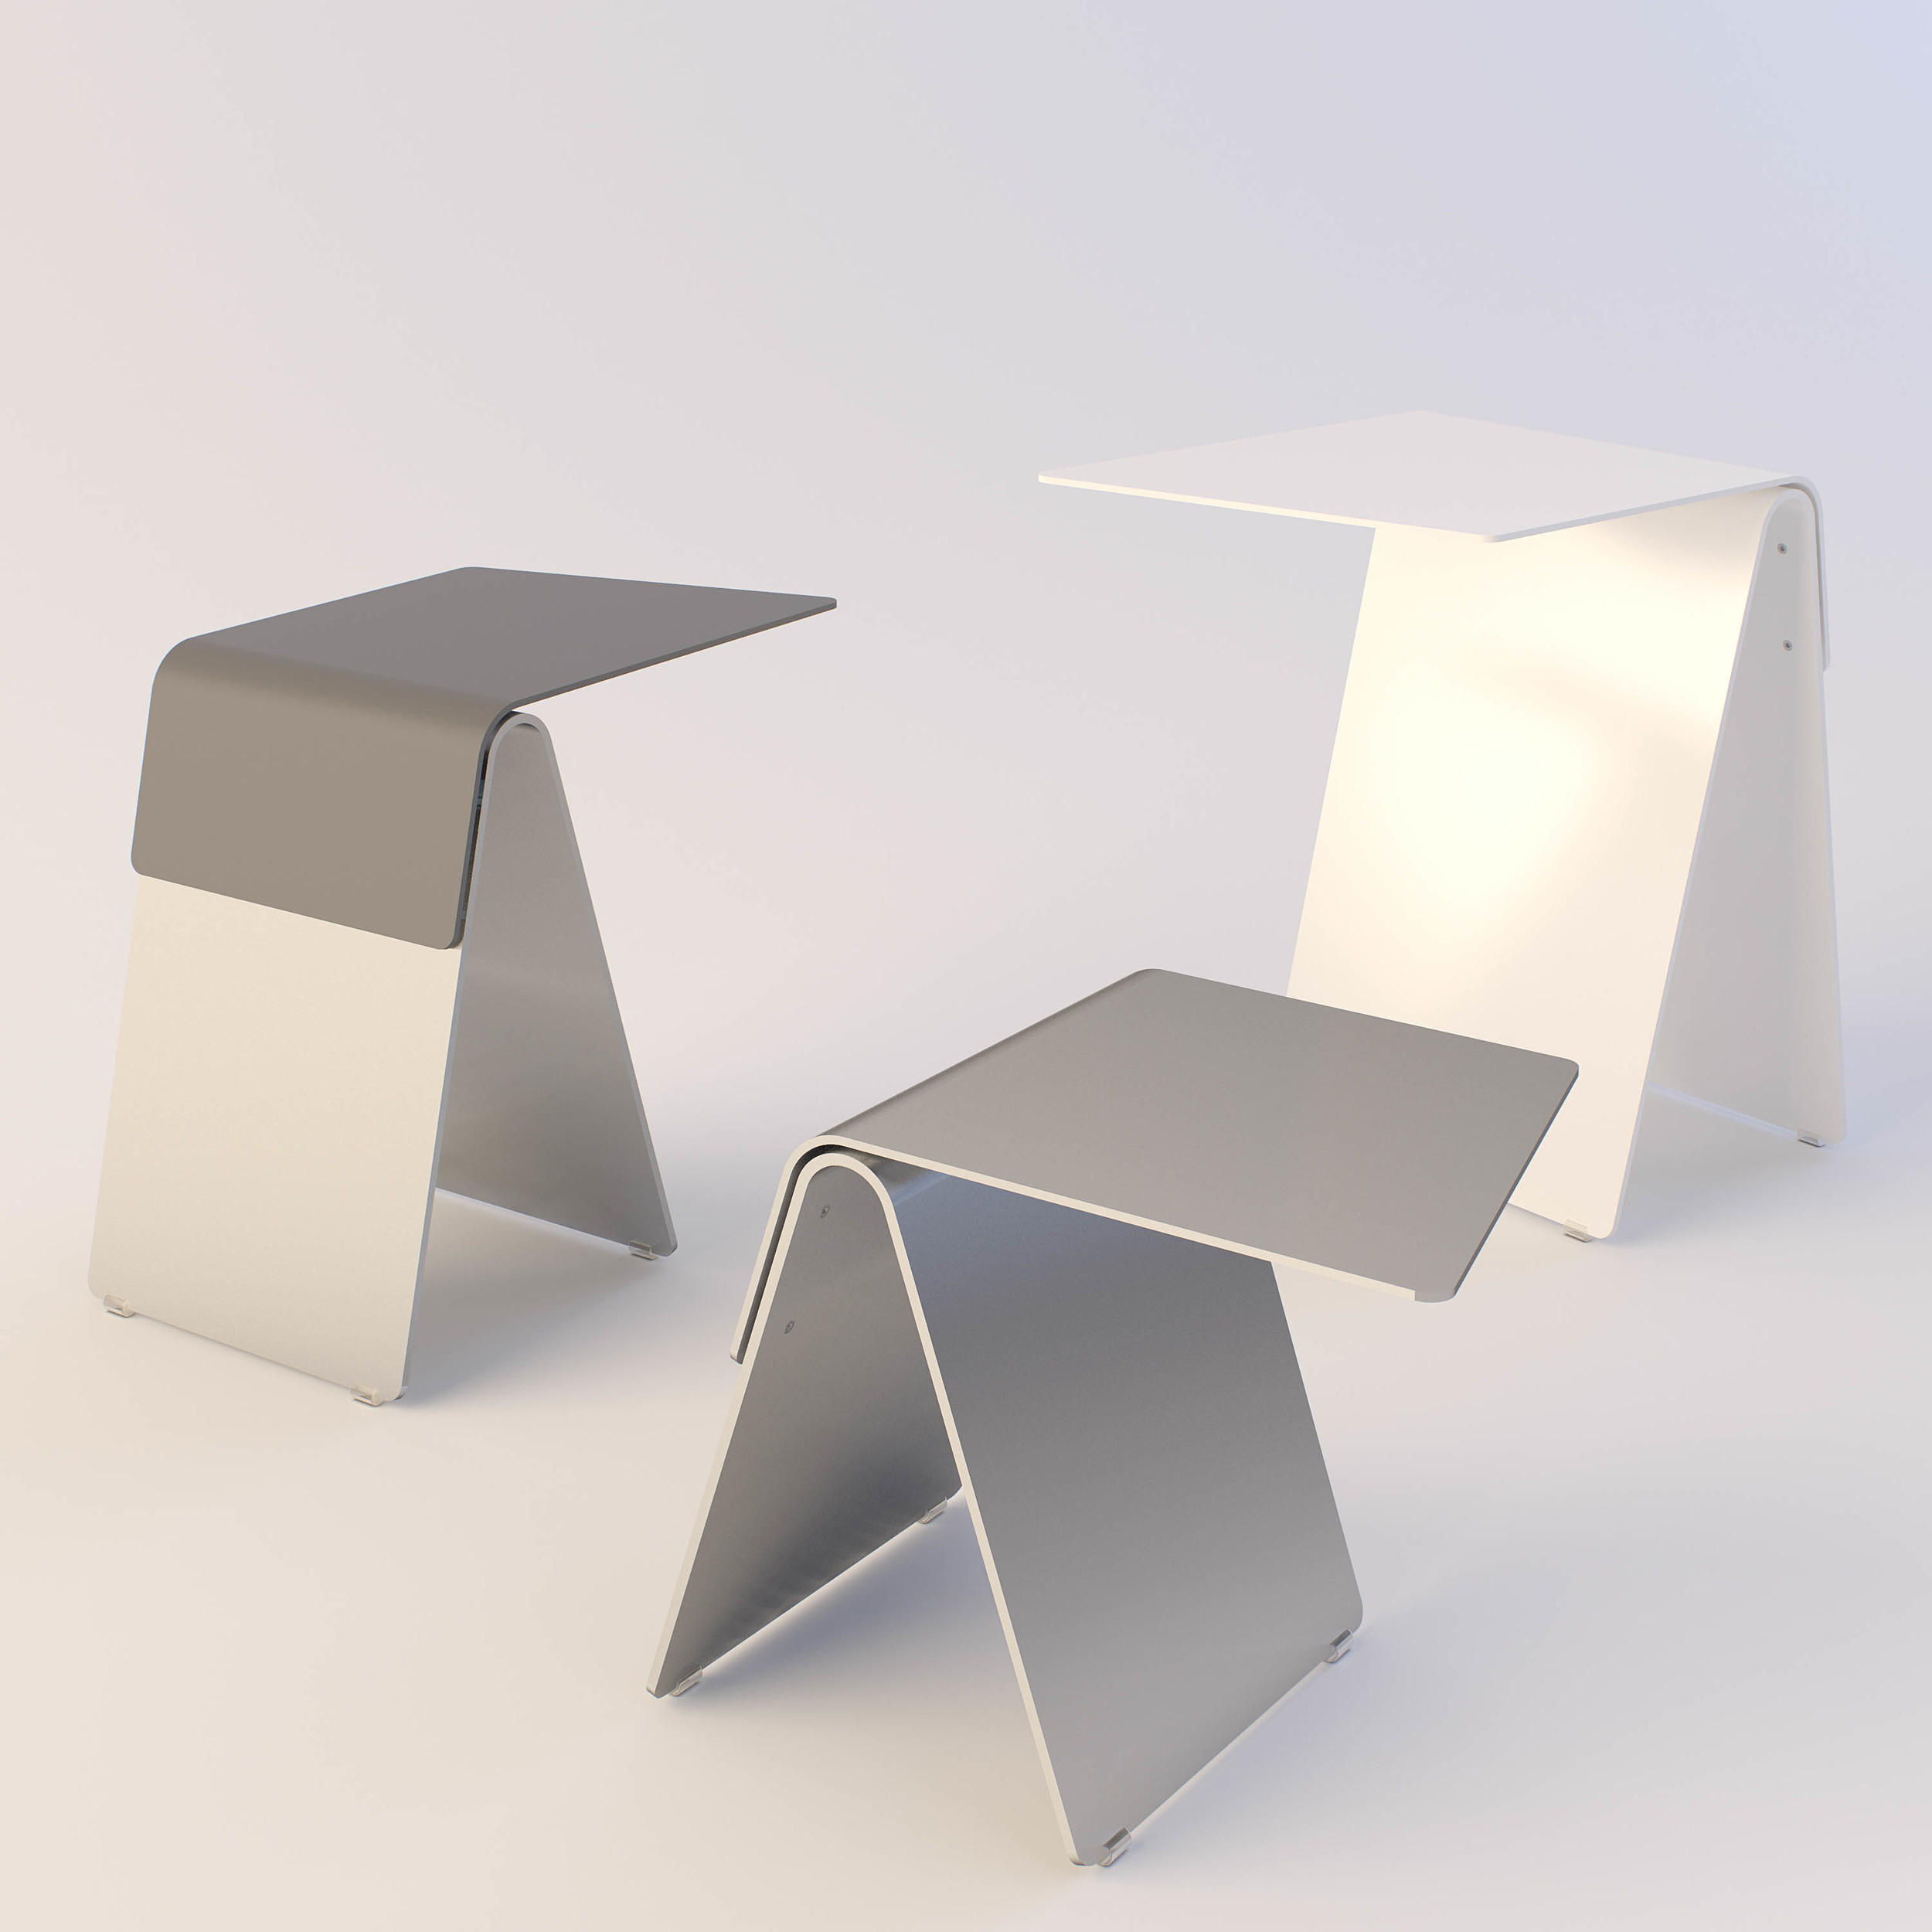 HANGOVER TABLES